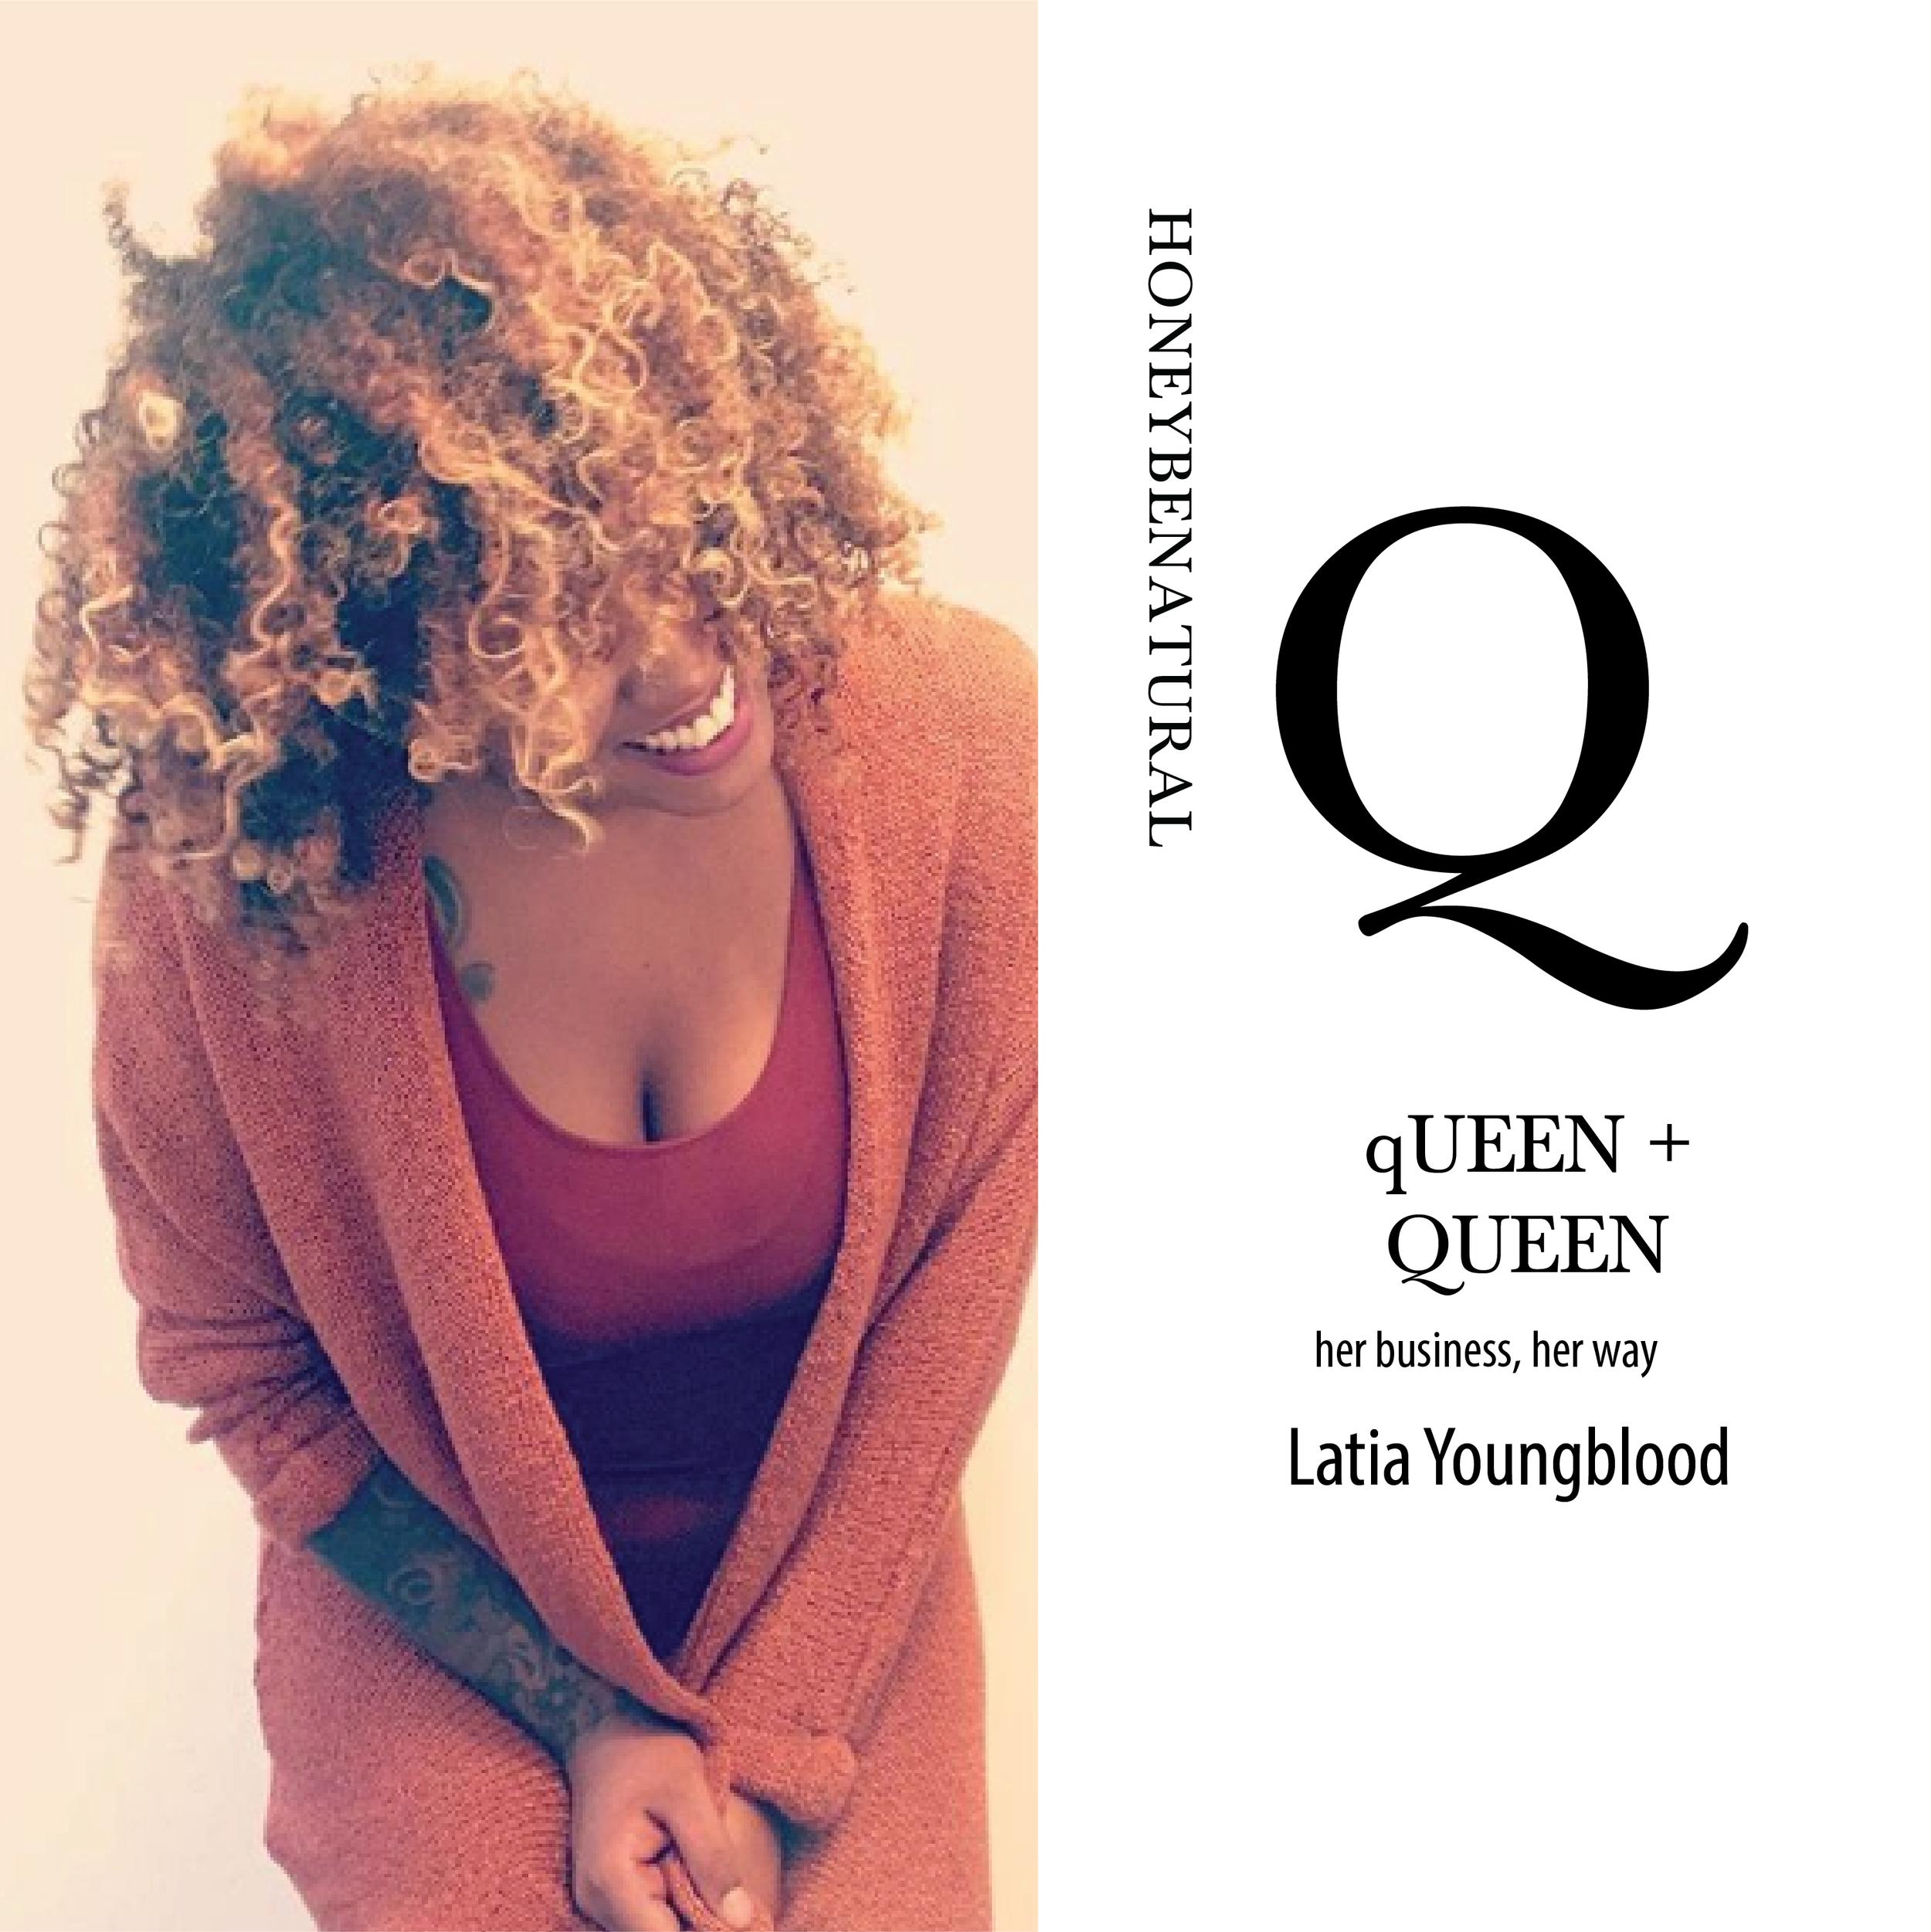 QueenPlusQueen_June 2019_LATIA YOUNGBLOOD_Title-01.png